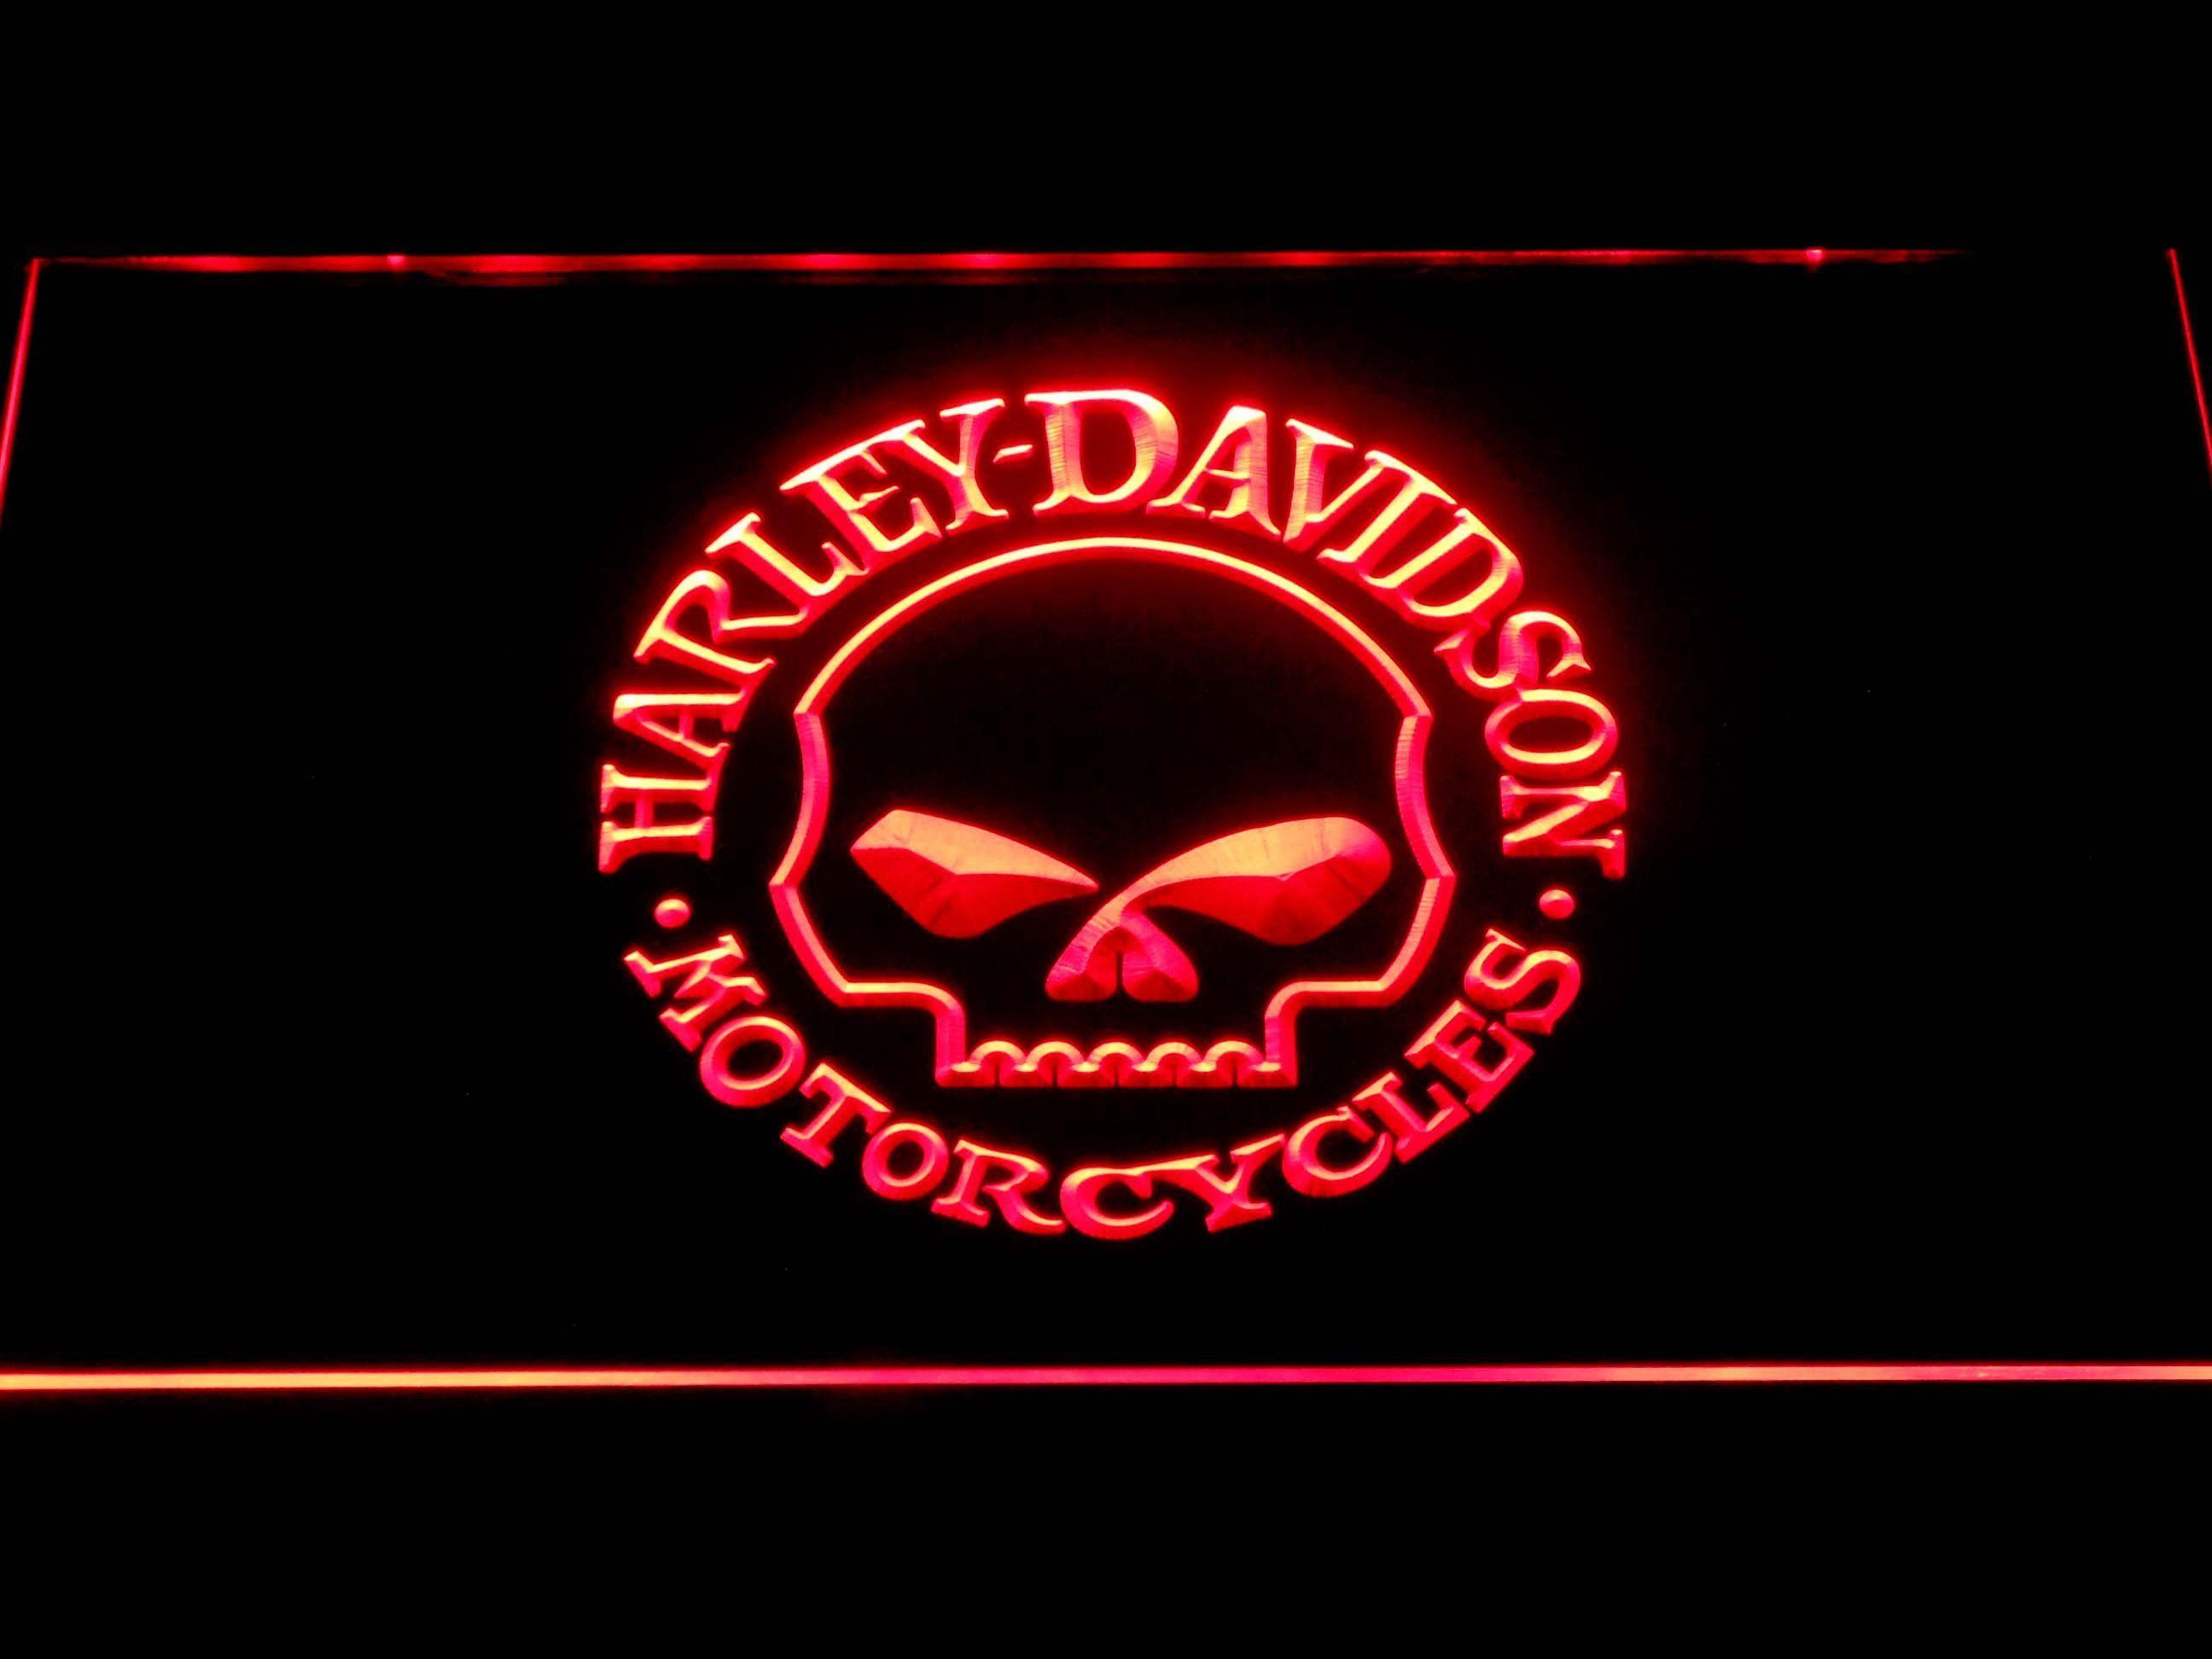 Harley Davidson Skull Led Neon Sign Led Neon Signs Neon Signs Harley Davidson